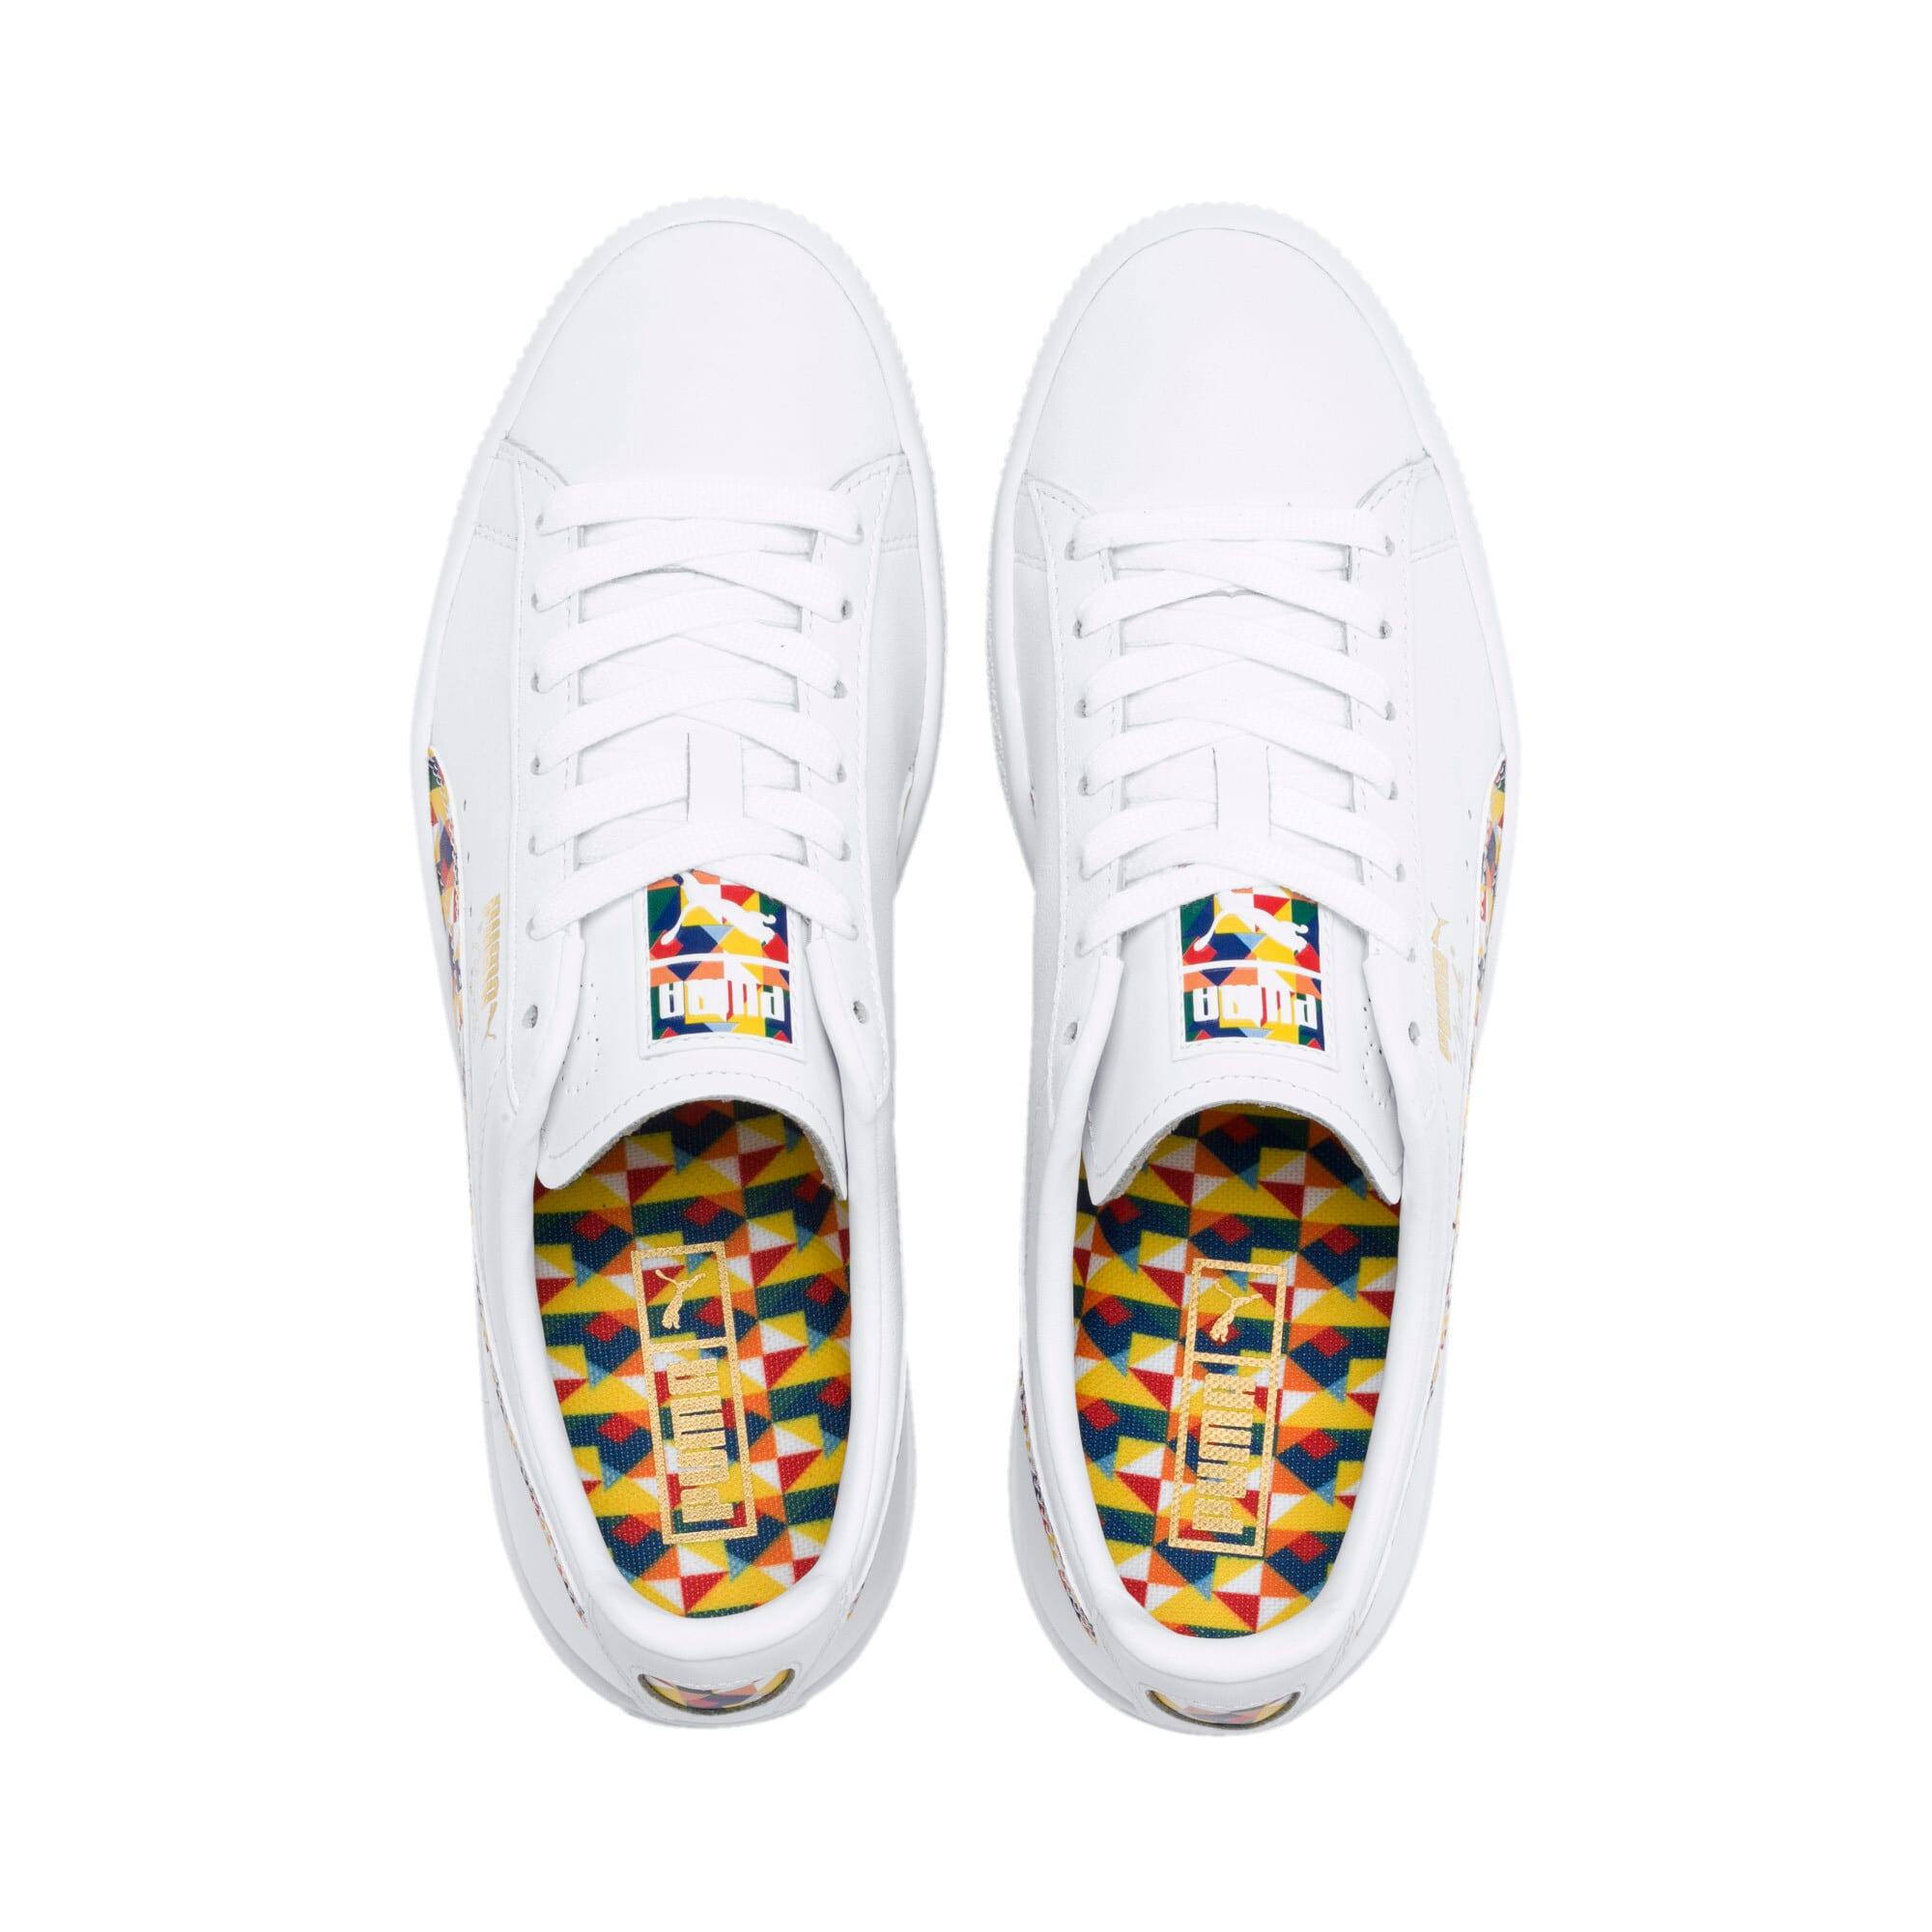 Thumbnail 7 of Clyde Graffiti Sneakers, Puma Wht-Dandelion-Puma Wht, medium